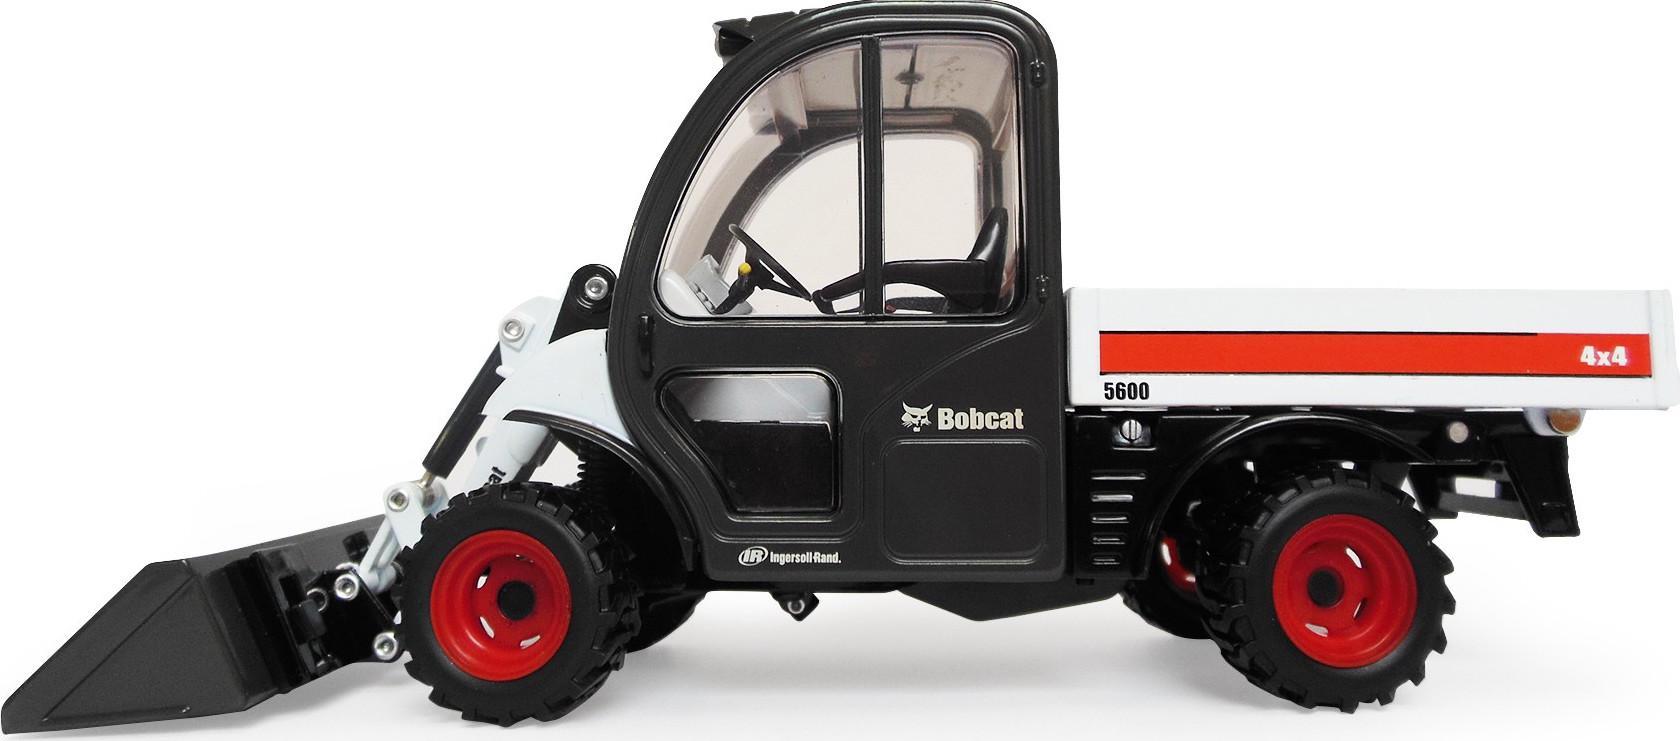 Bobcat Toolcat 5600 Utility Work Machine Factory Service